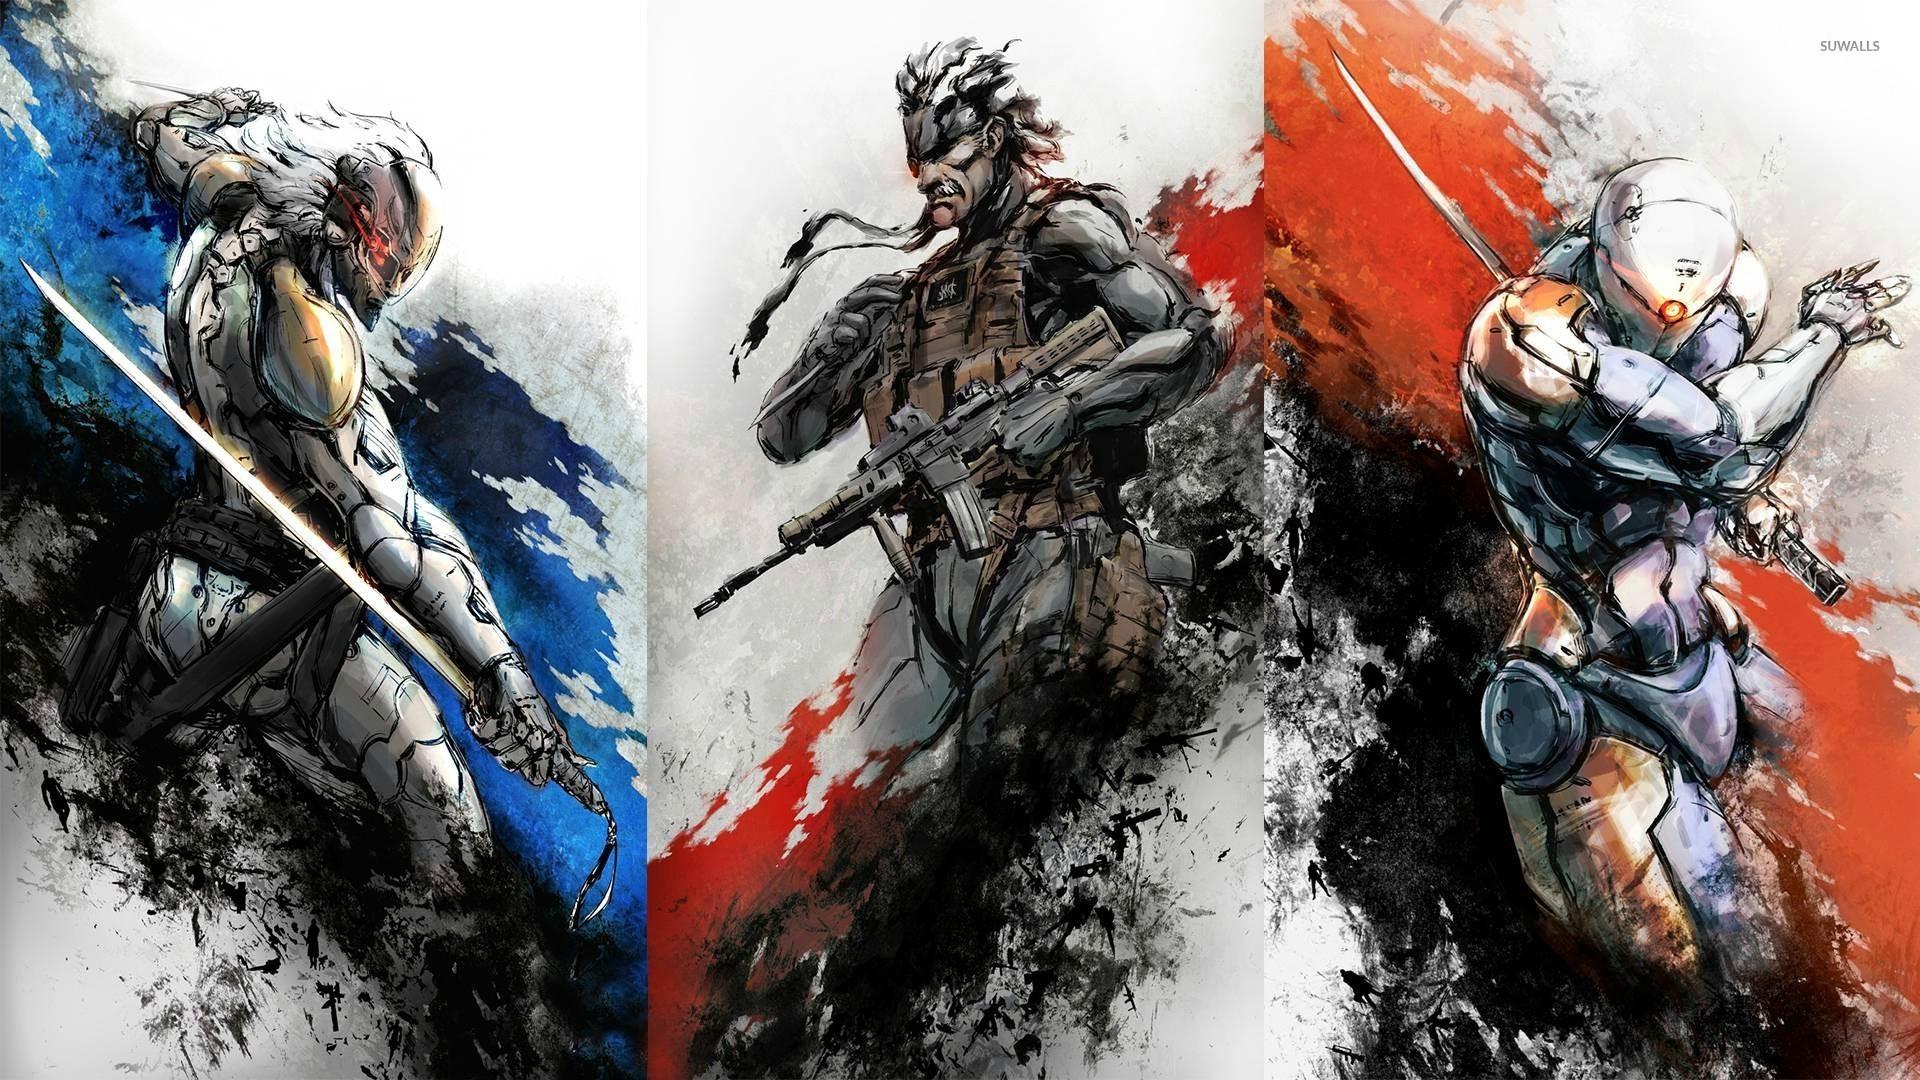 Metal Gear Solid V Wallpaper: Metal Gear Solid Rising Wallpapers (77+ Images